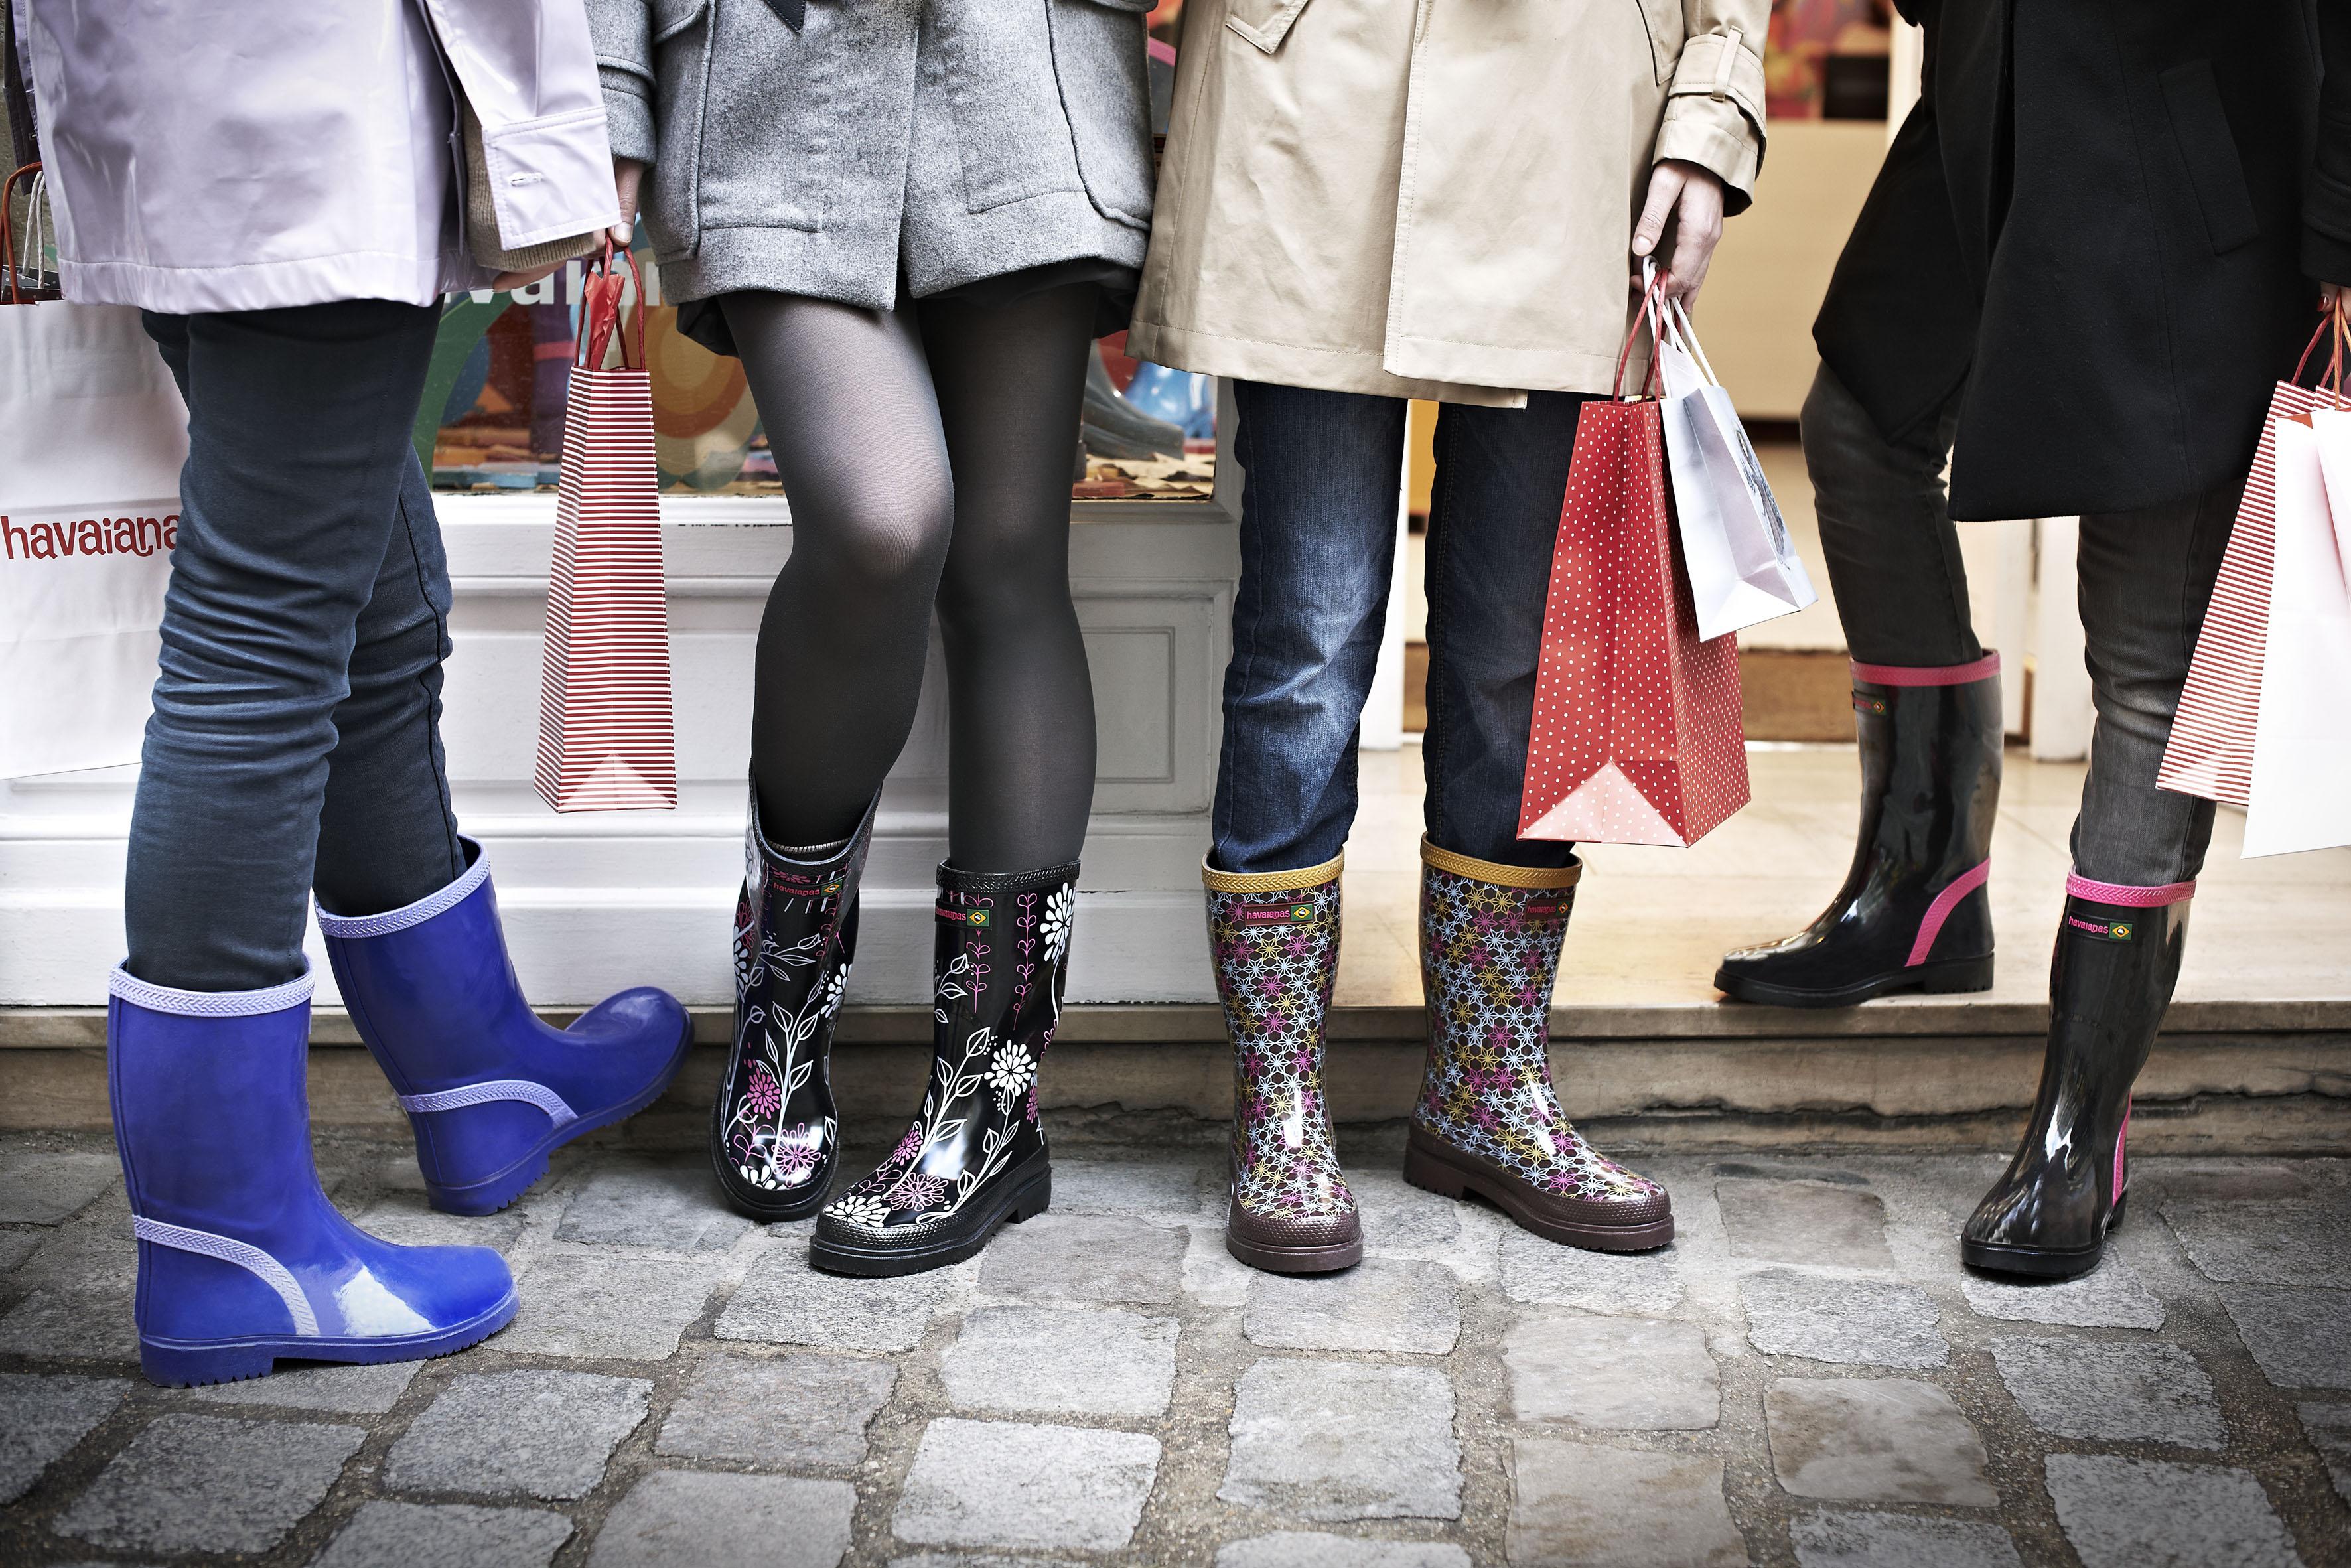 havaianas-boots